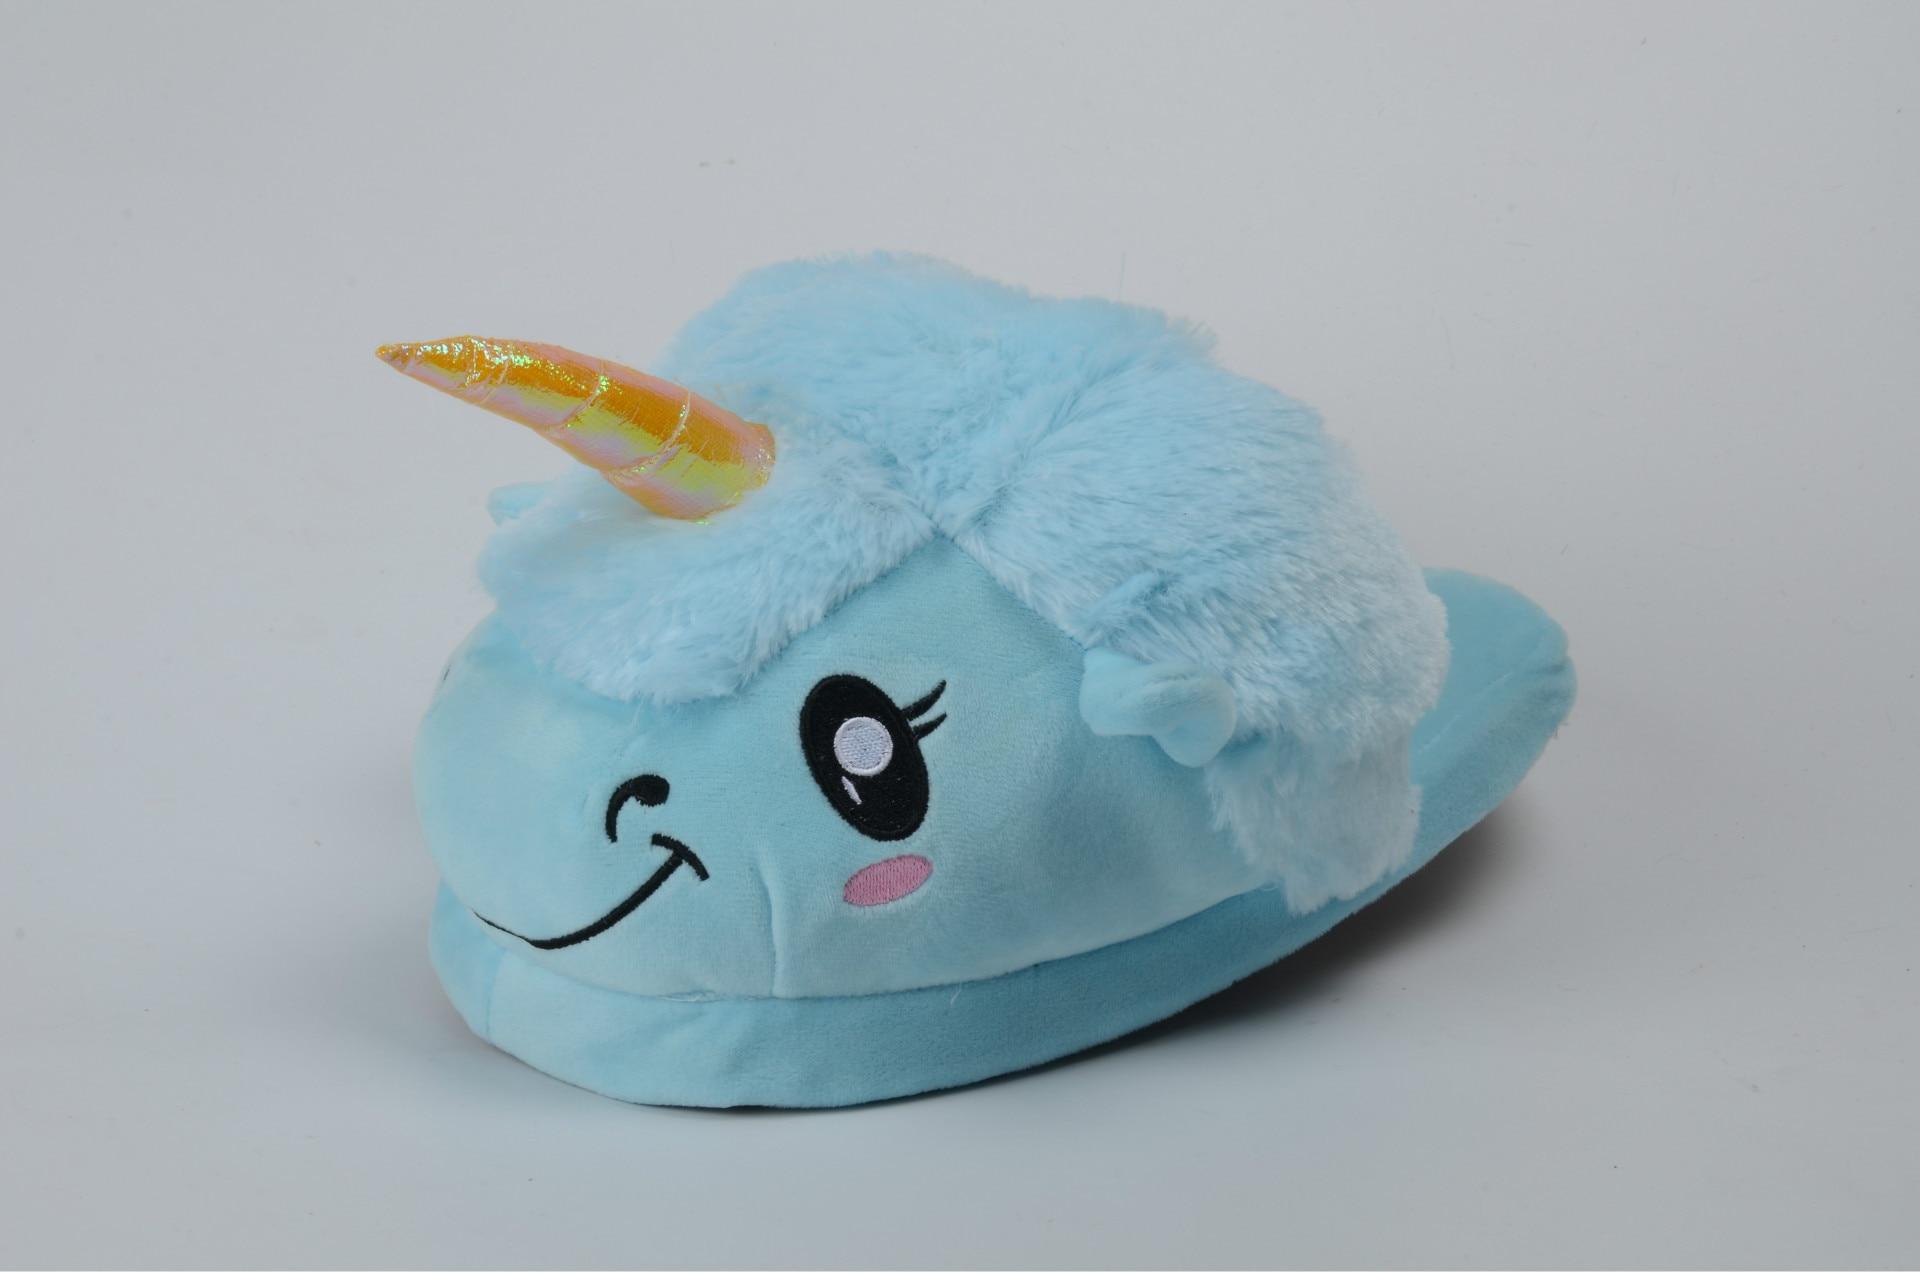 New Unicorn Slippers Kids Winter Warm Plush Baby Boy Girls Slippers